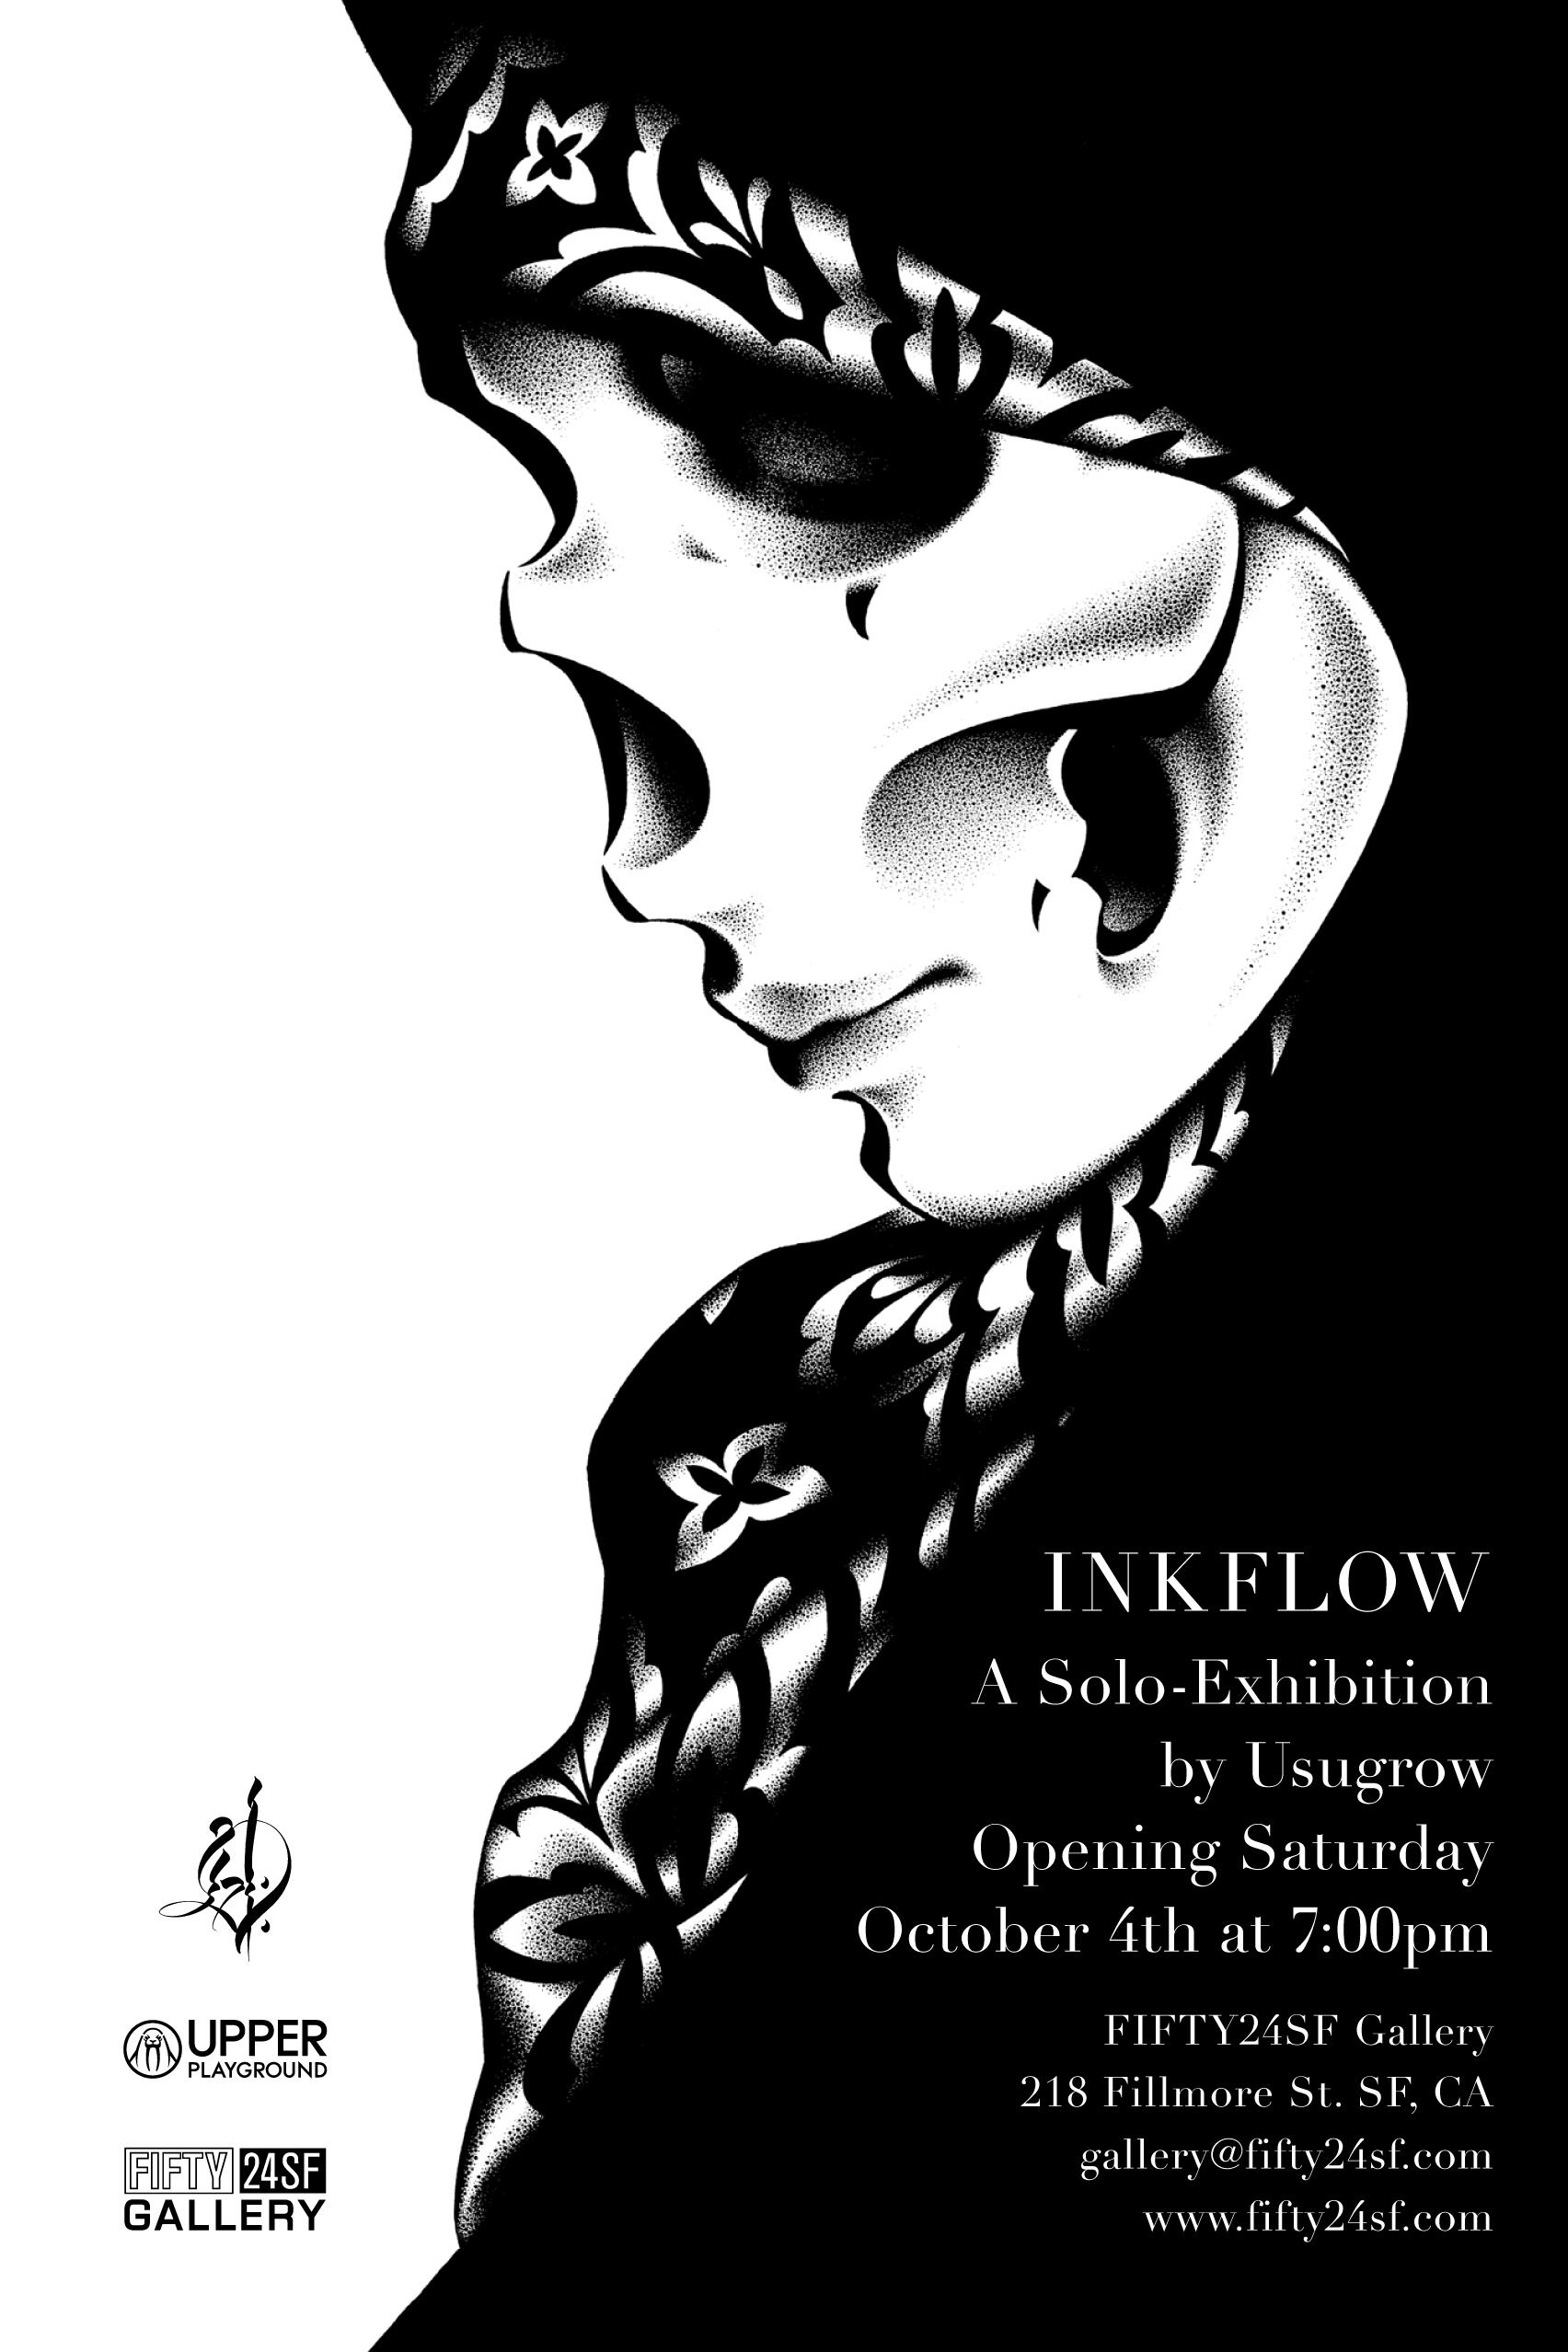 Usugrow_Inkflow_fifty24sf-upper-playground.jpg